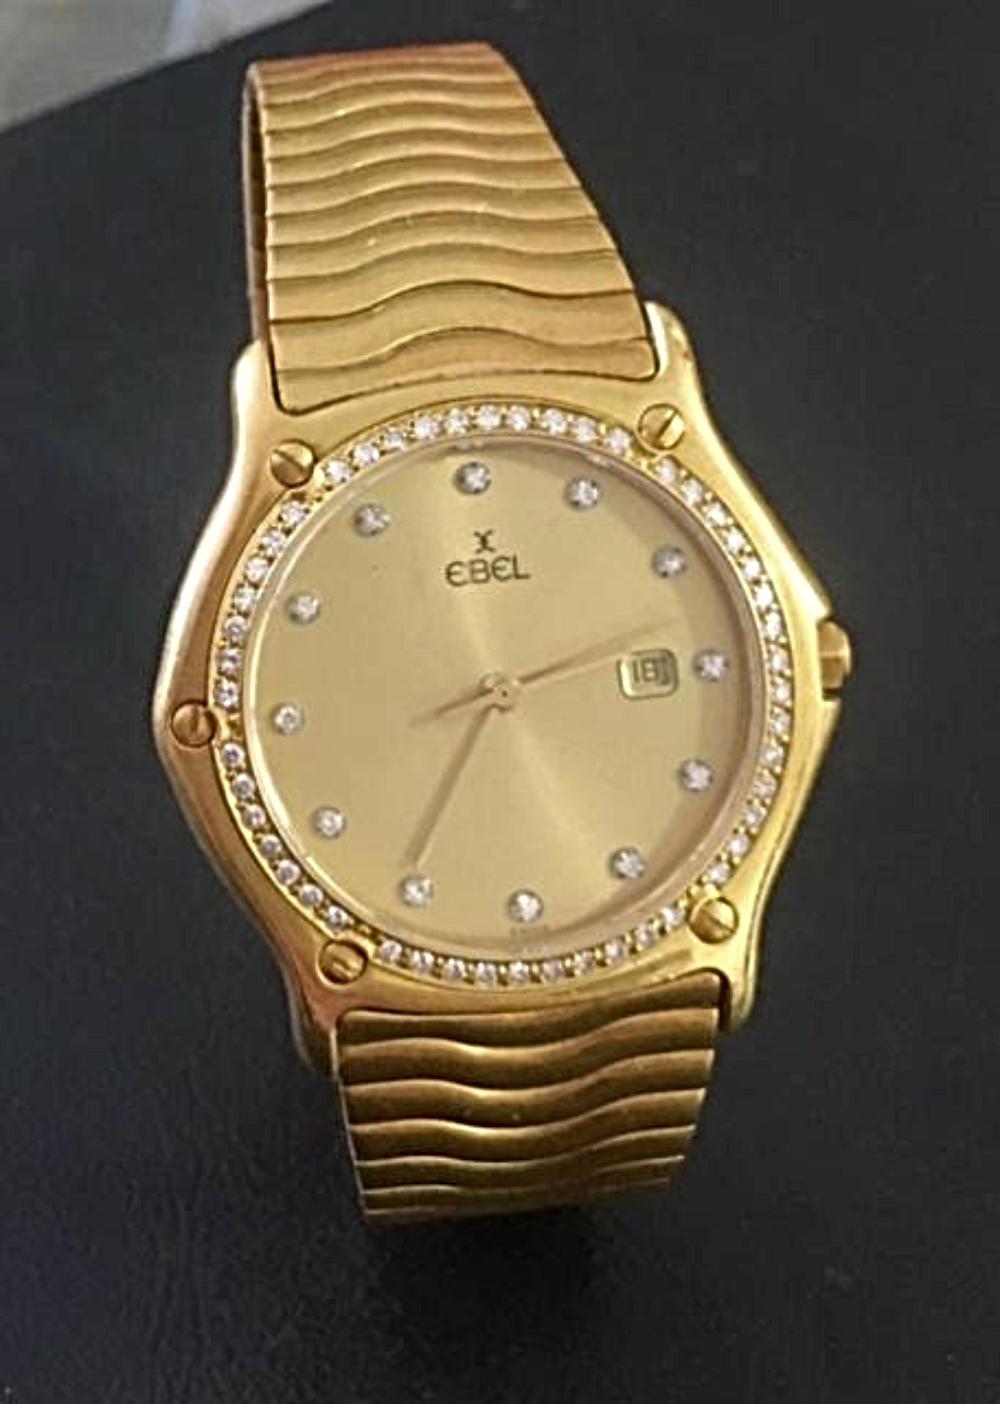 Mens EBEL 18K Gold & Diamonds Swiss Wrist Watch Classic